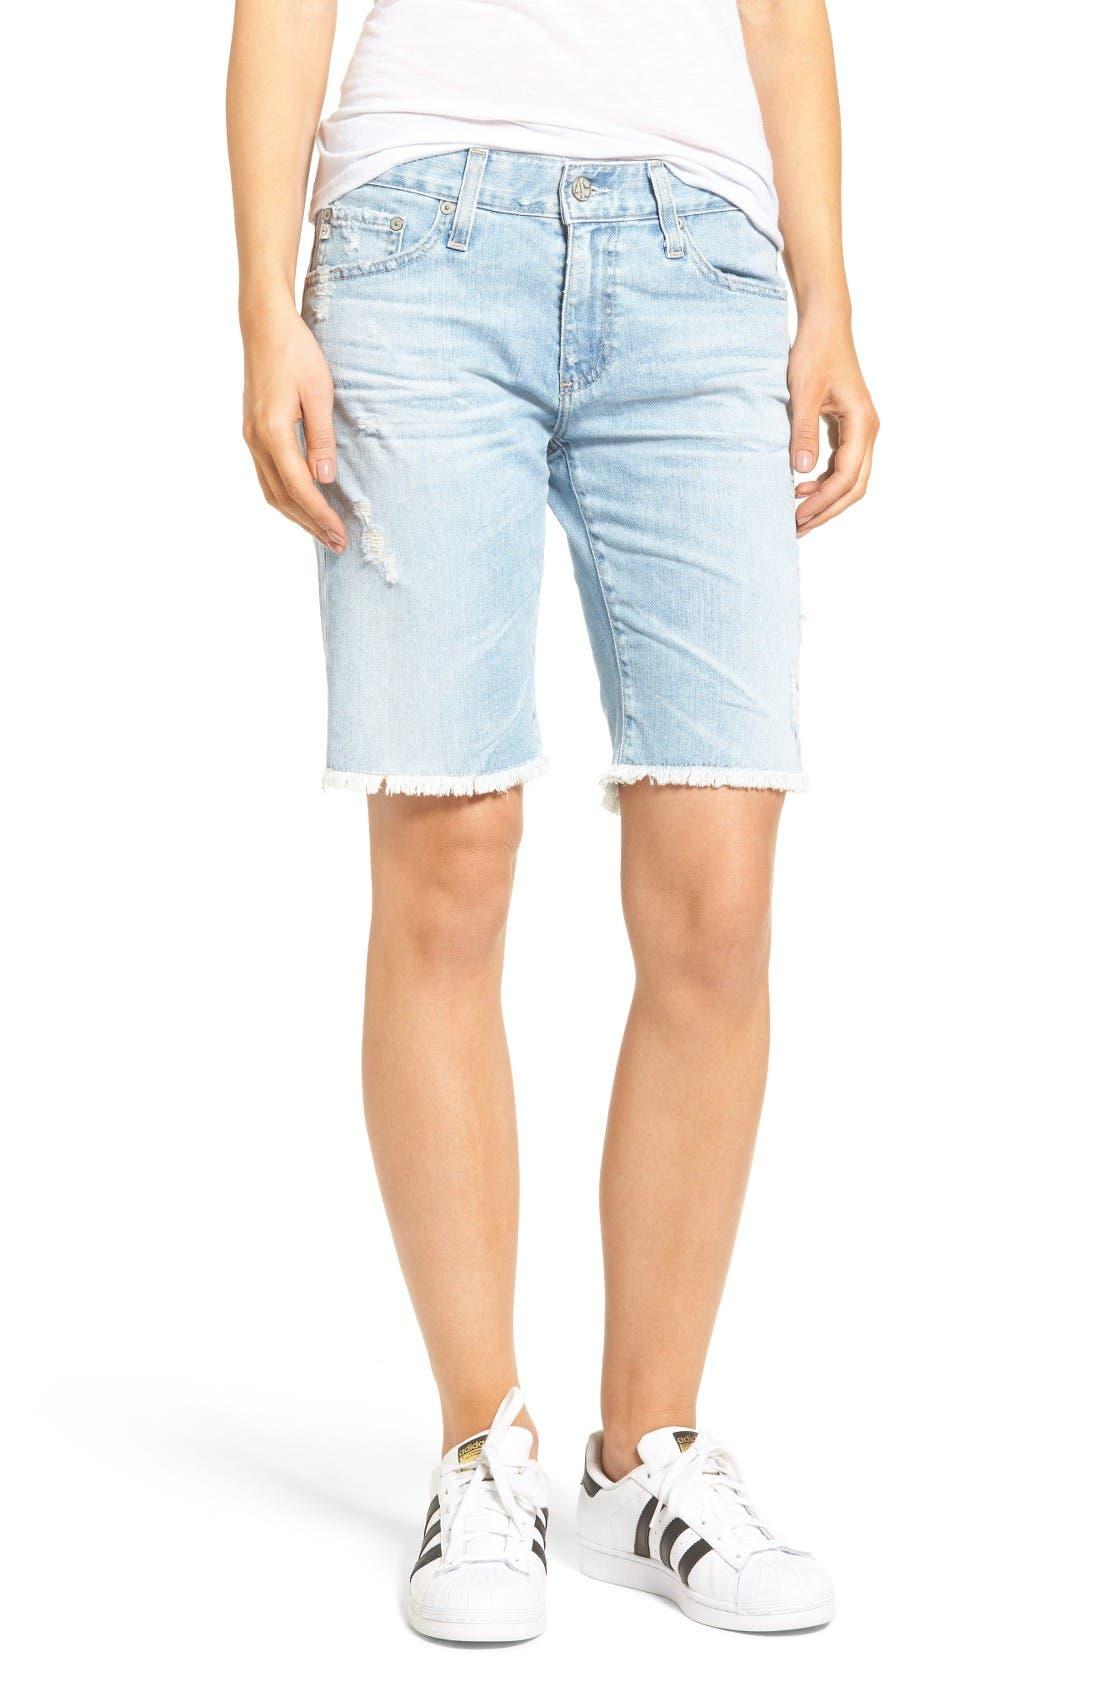 Alternate Image 1 Selected - AG The Nikki Denim Bermuda Shorts (24 Year Relief)